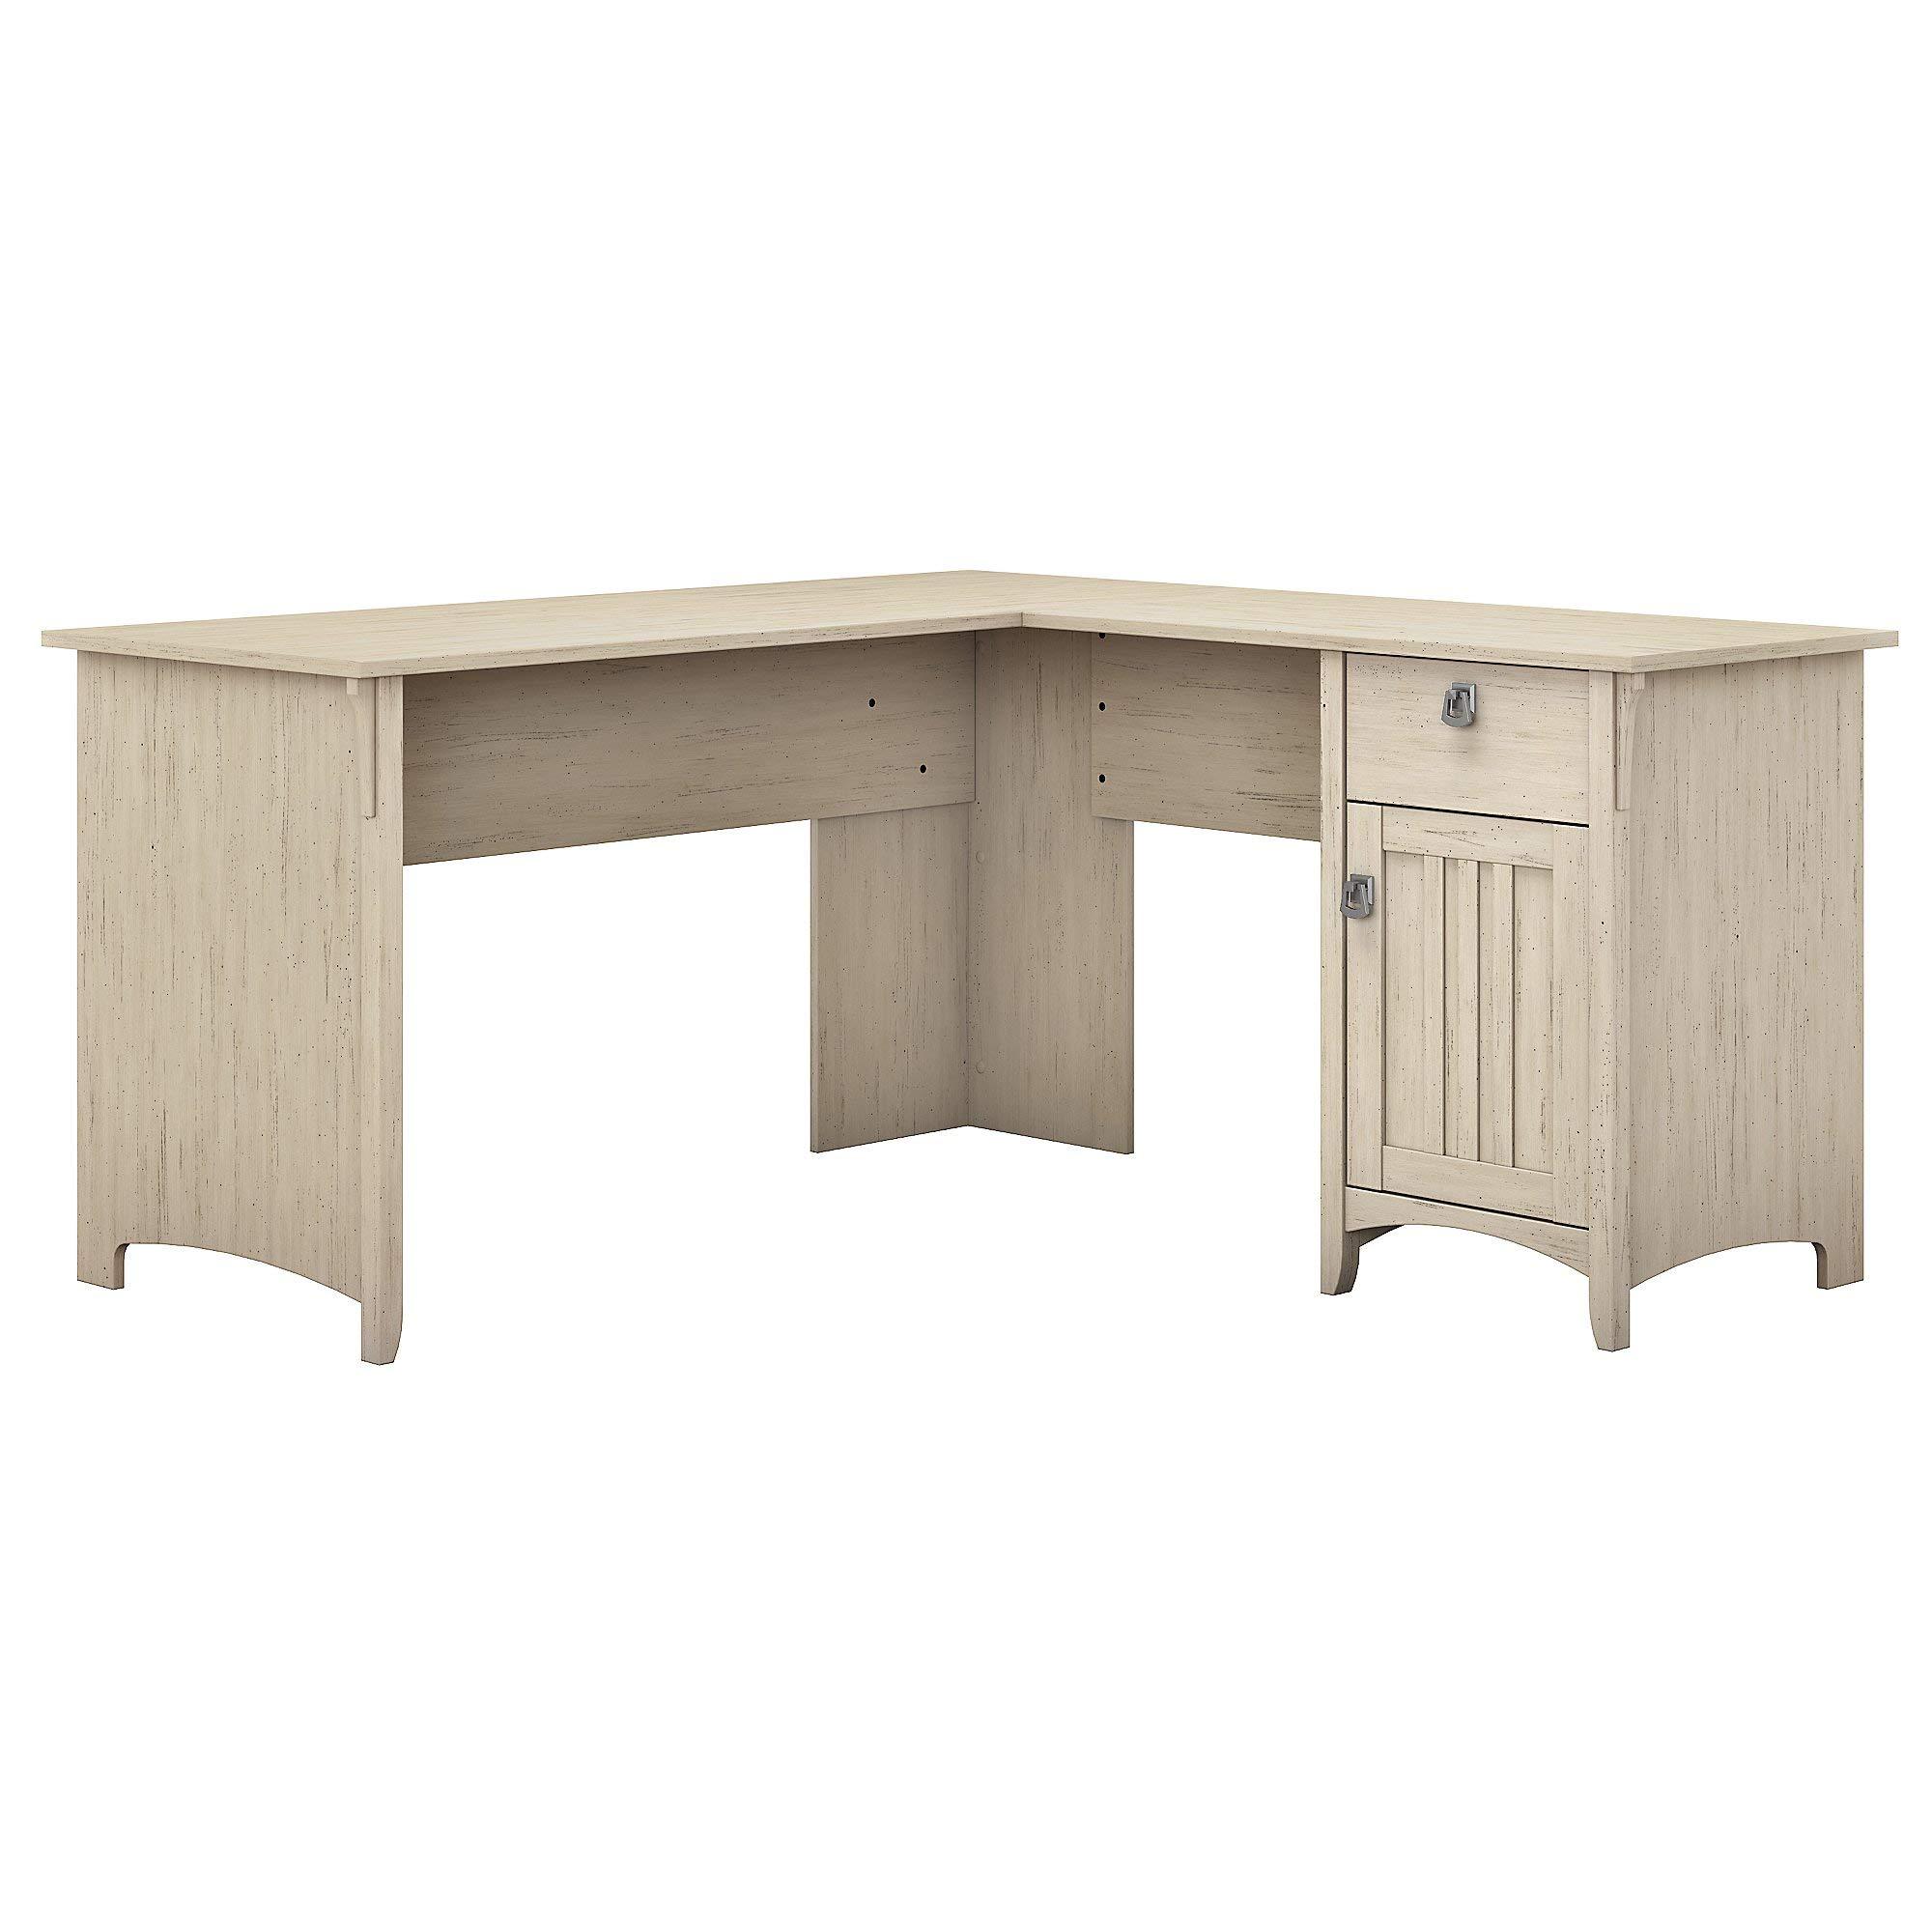 Bush Furniture Salinas L Shaped Desk with Storage in Antique White by Bush Furniture